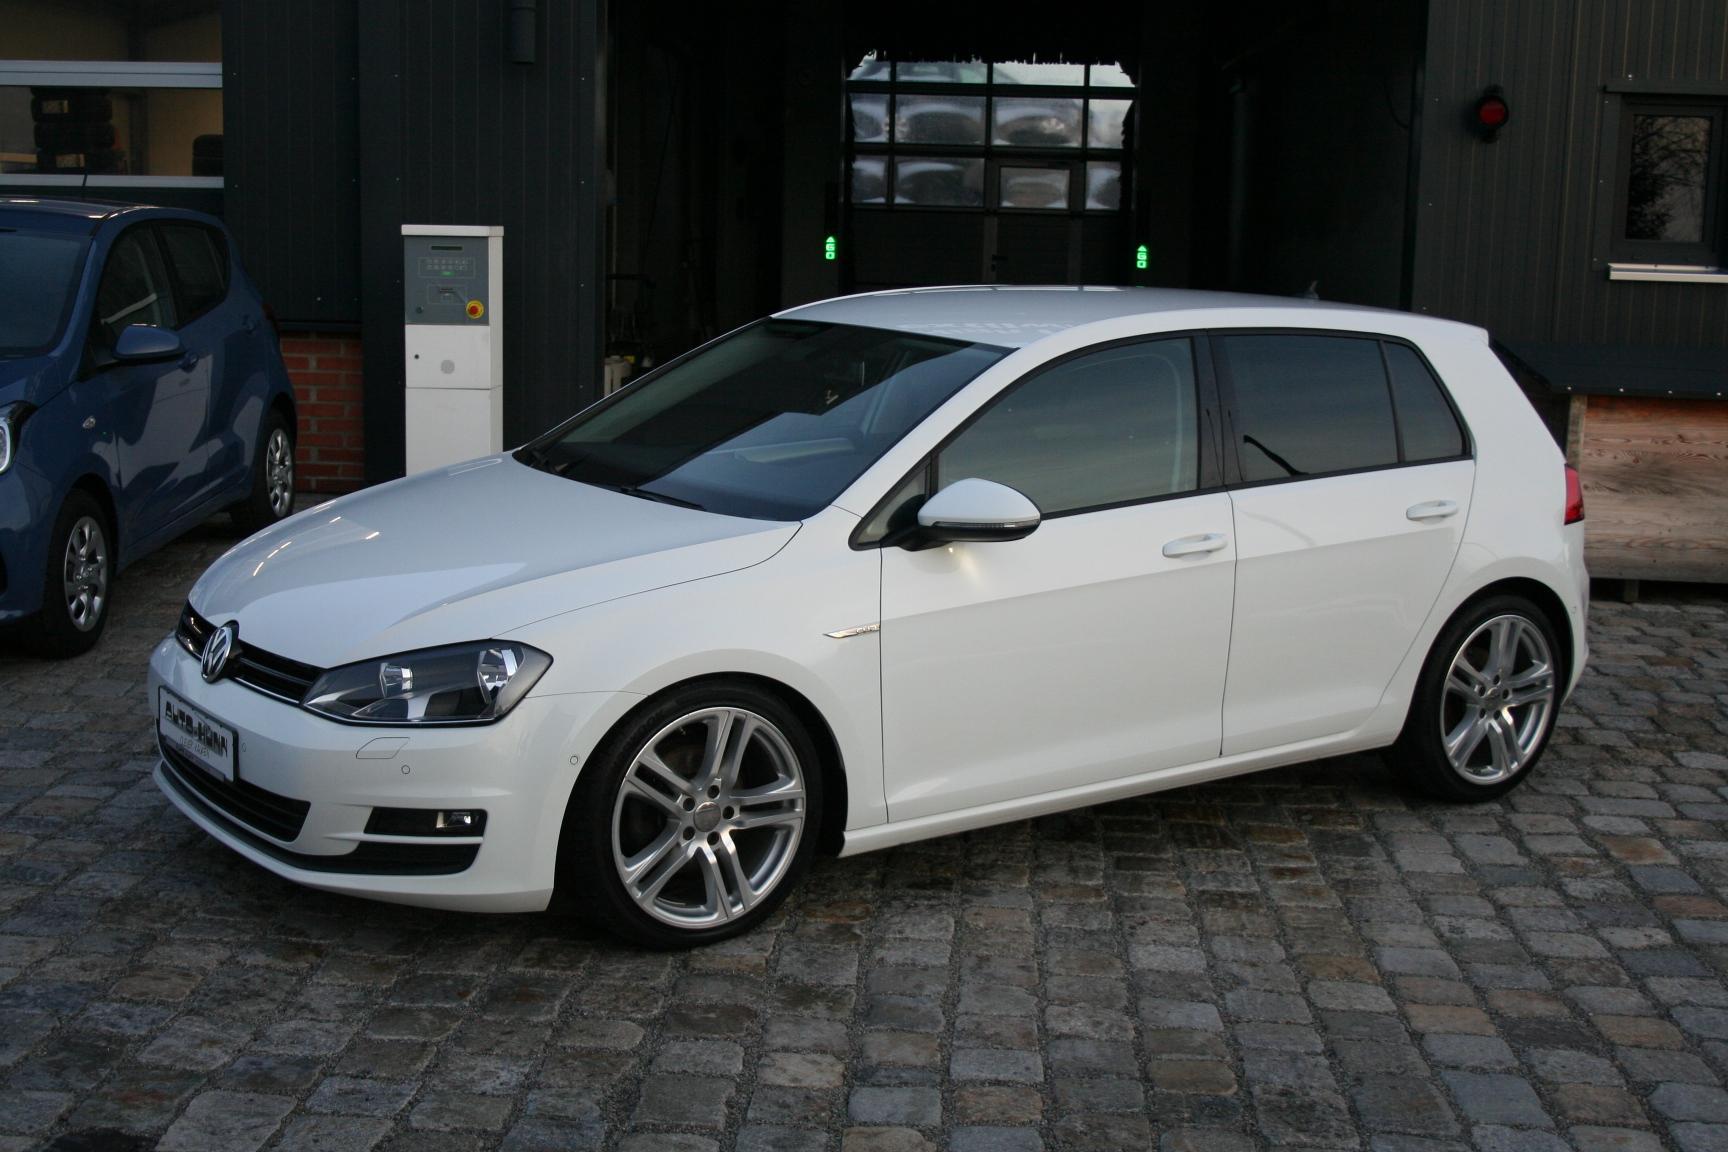 Volkswagen Golf 7 1 6 Tdi 110 Ps Bluemotion Cup Navi Climatronic